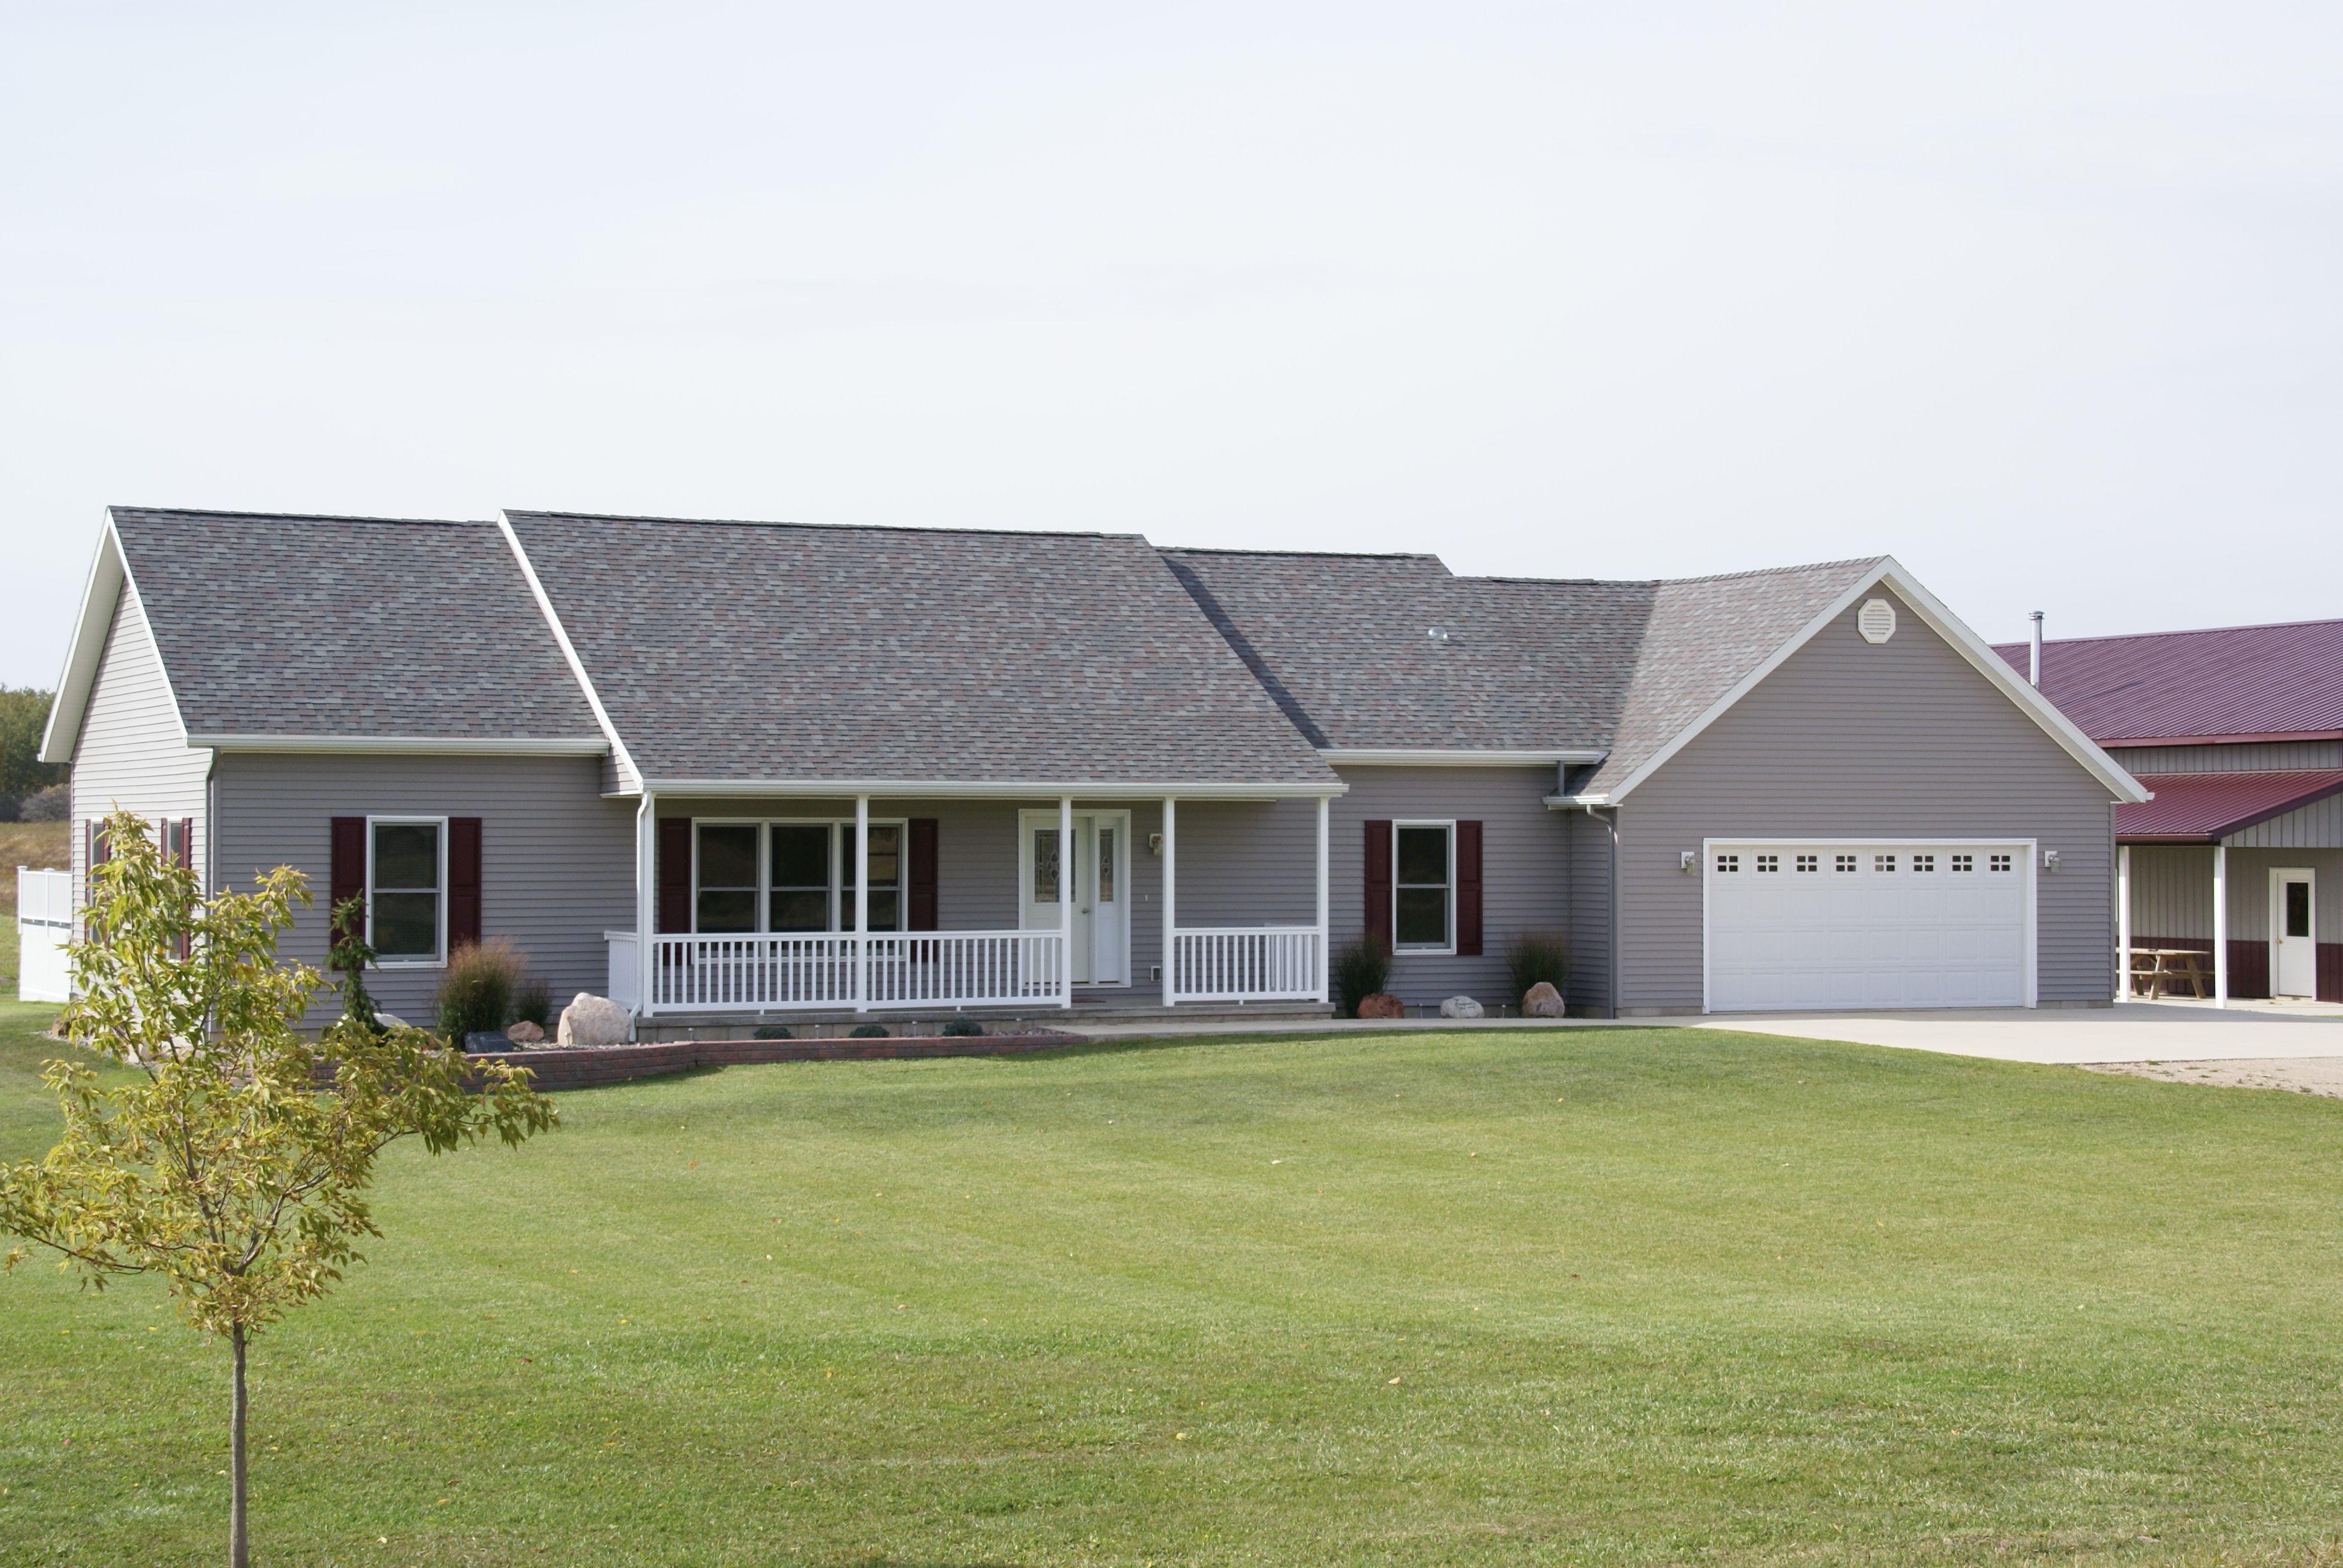 Custom Ranch Modularhomes By Northwood Modular Homes Inc